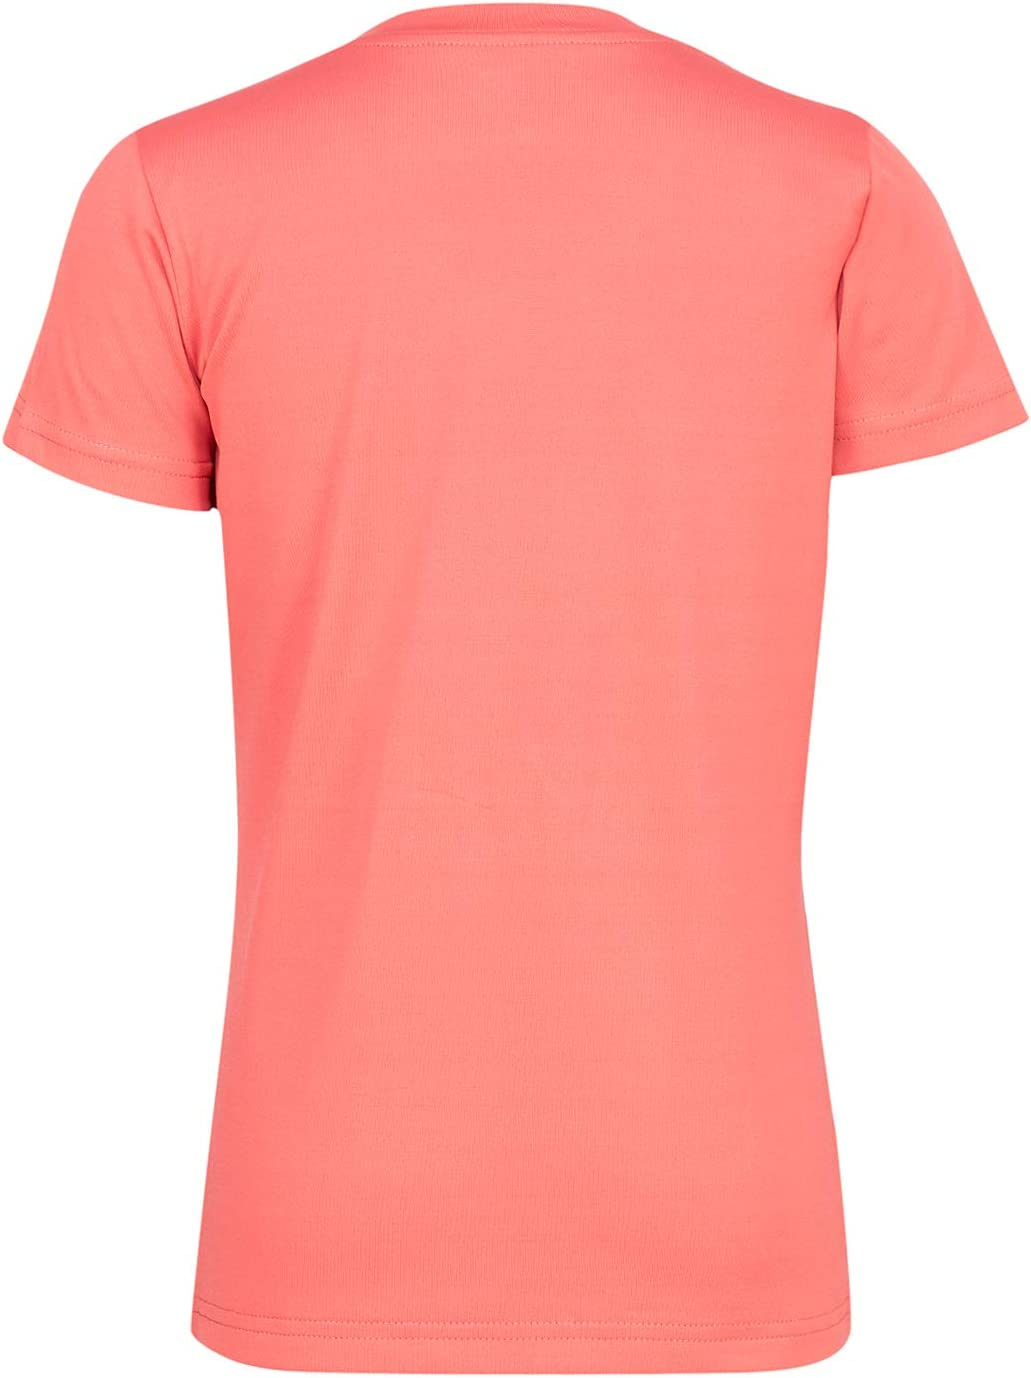 TuffRider Childrens Taylor Tee Short Sleeve T-Shirt